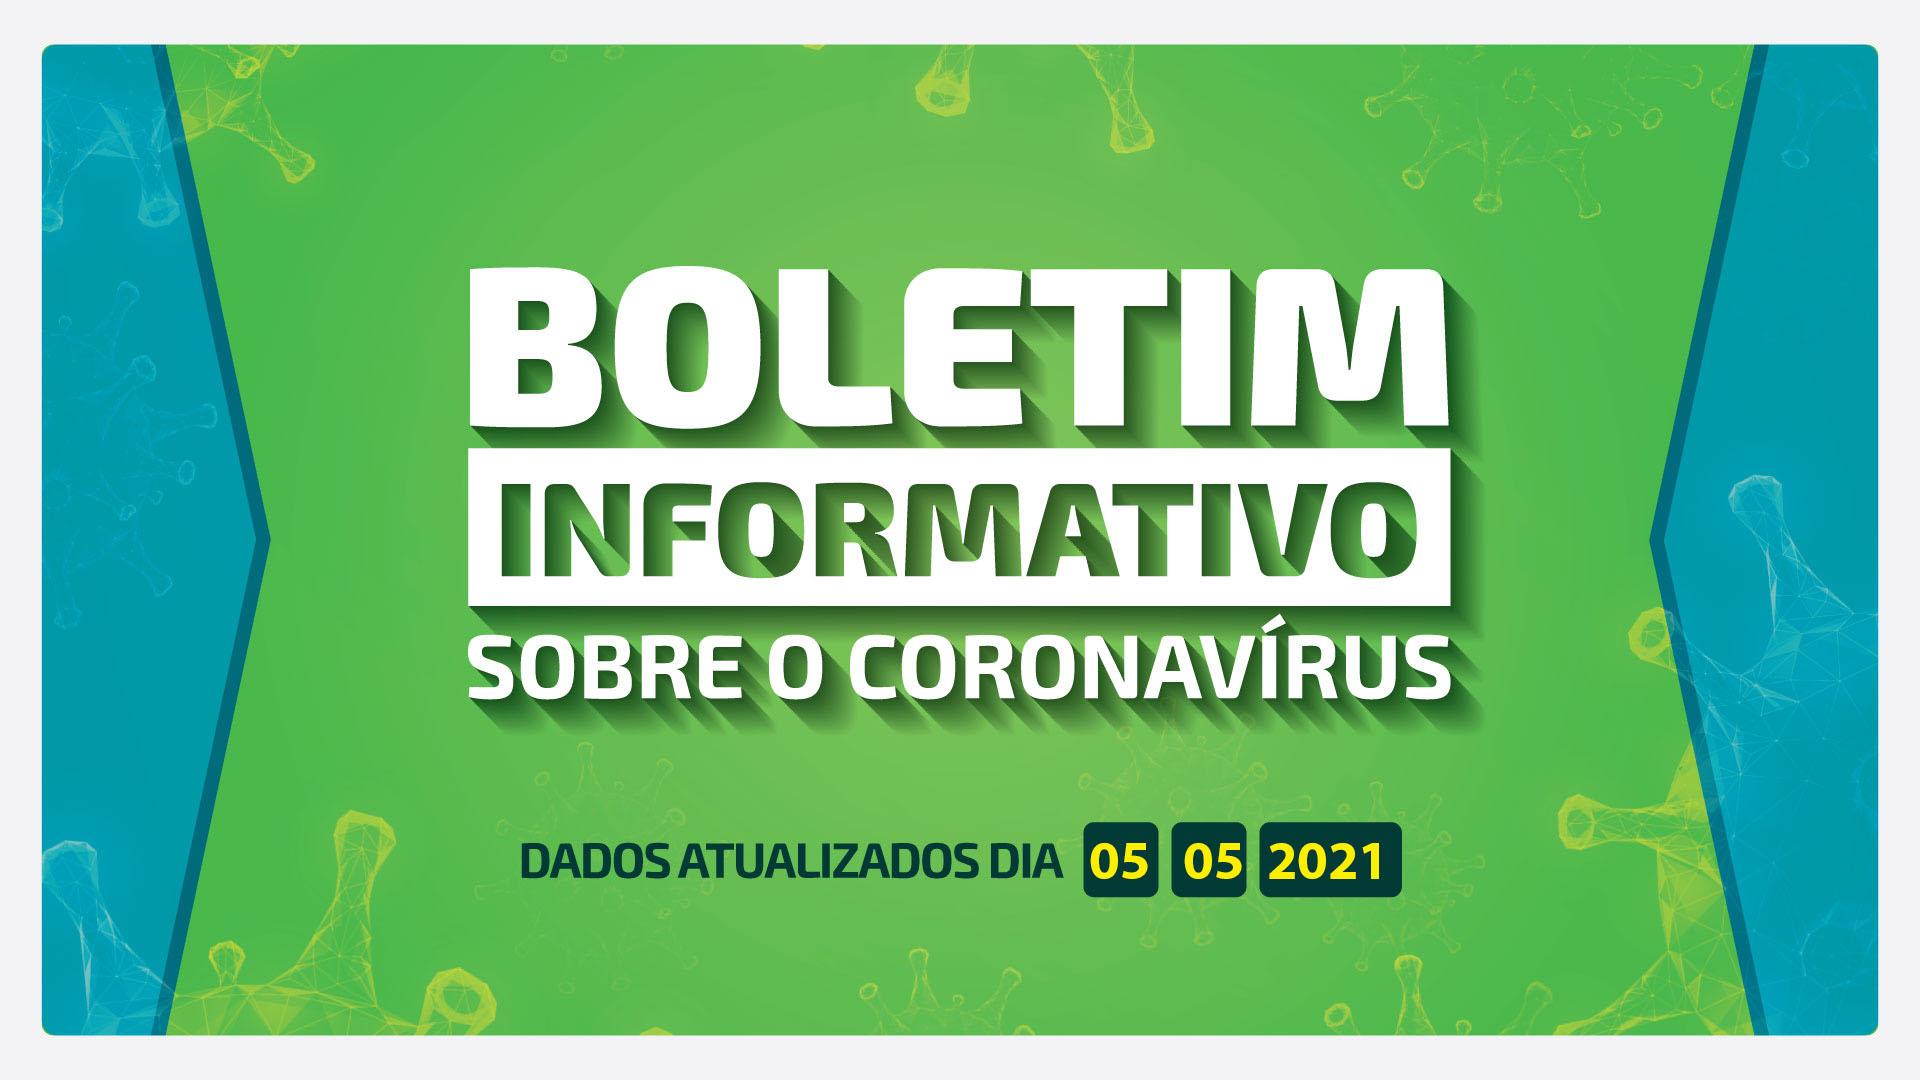 BOLETIM DIÁRIO CORONAVÍRUS - 05/05/2021